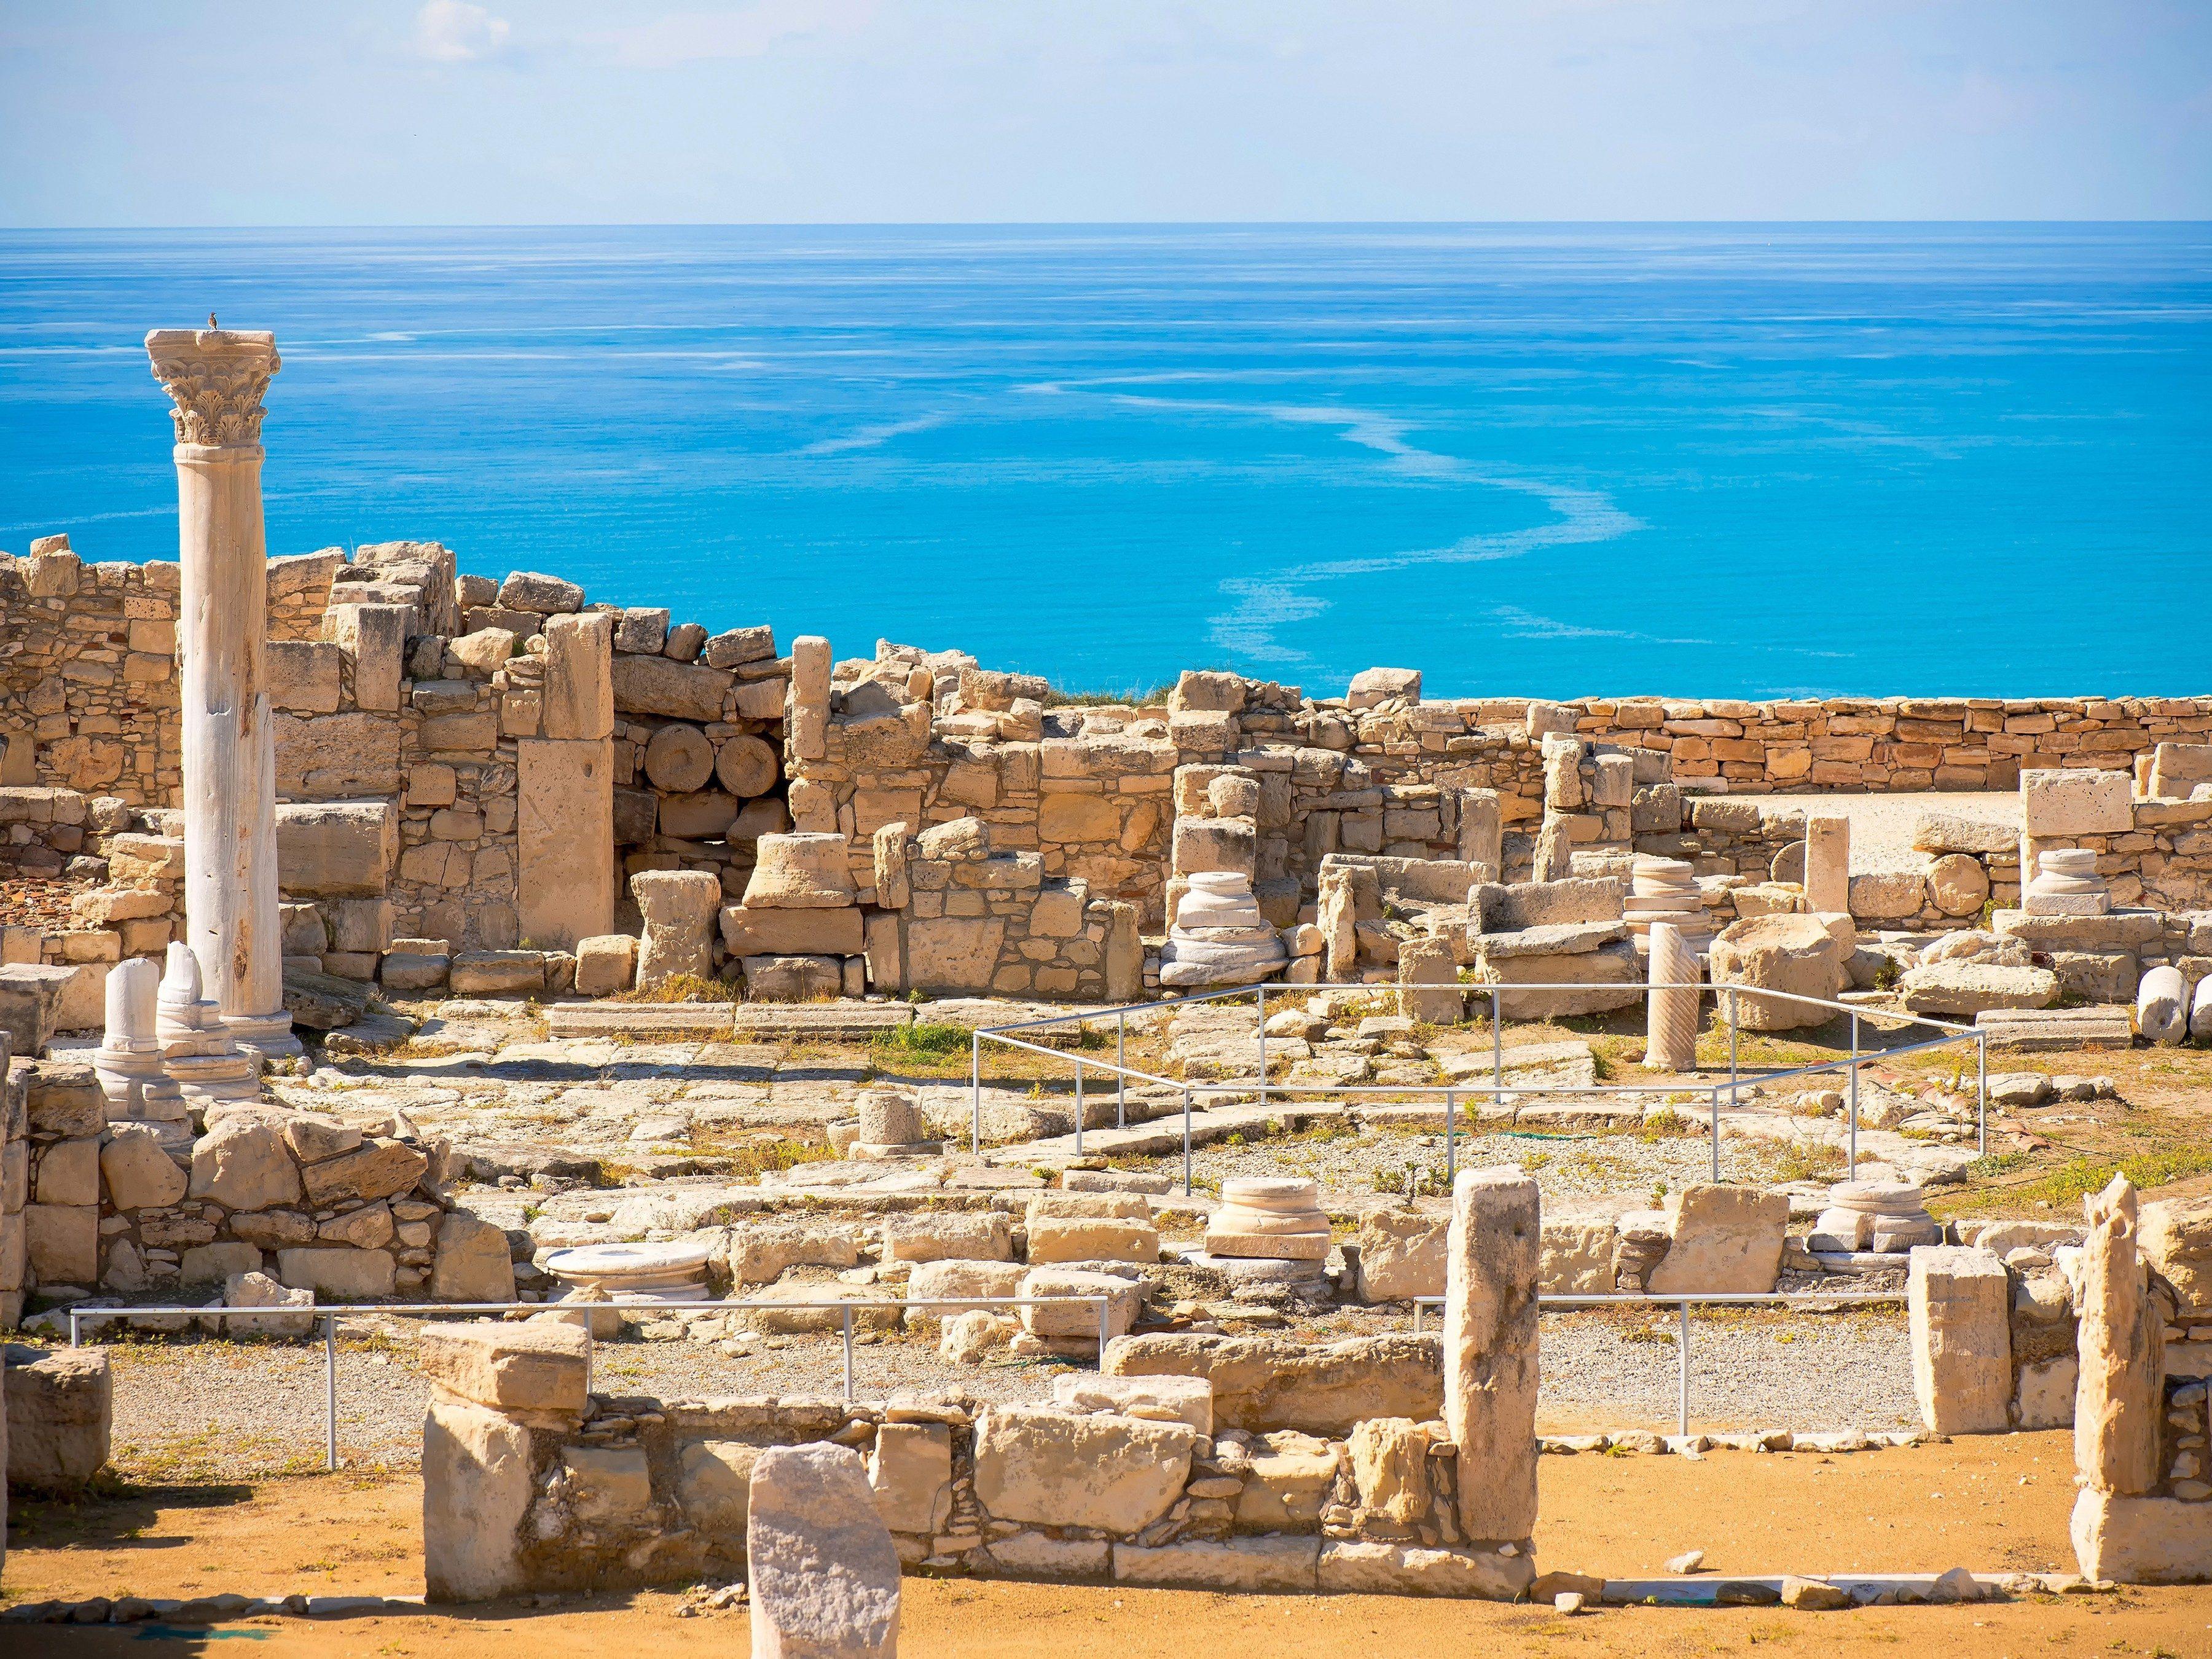 9. Cyprus